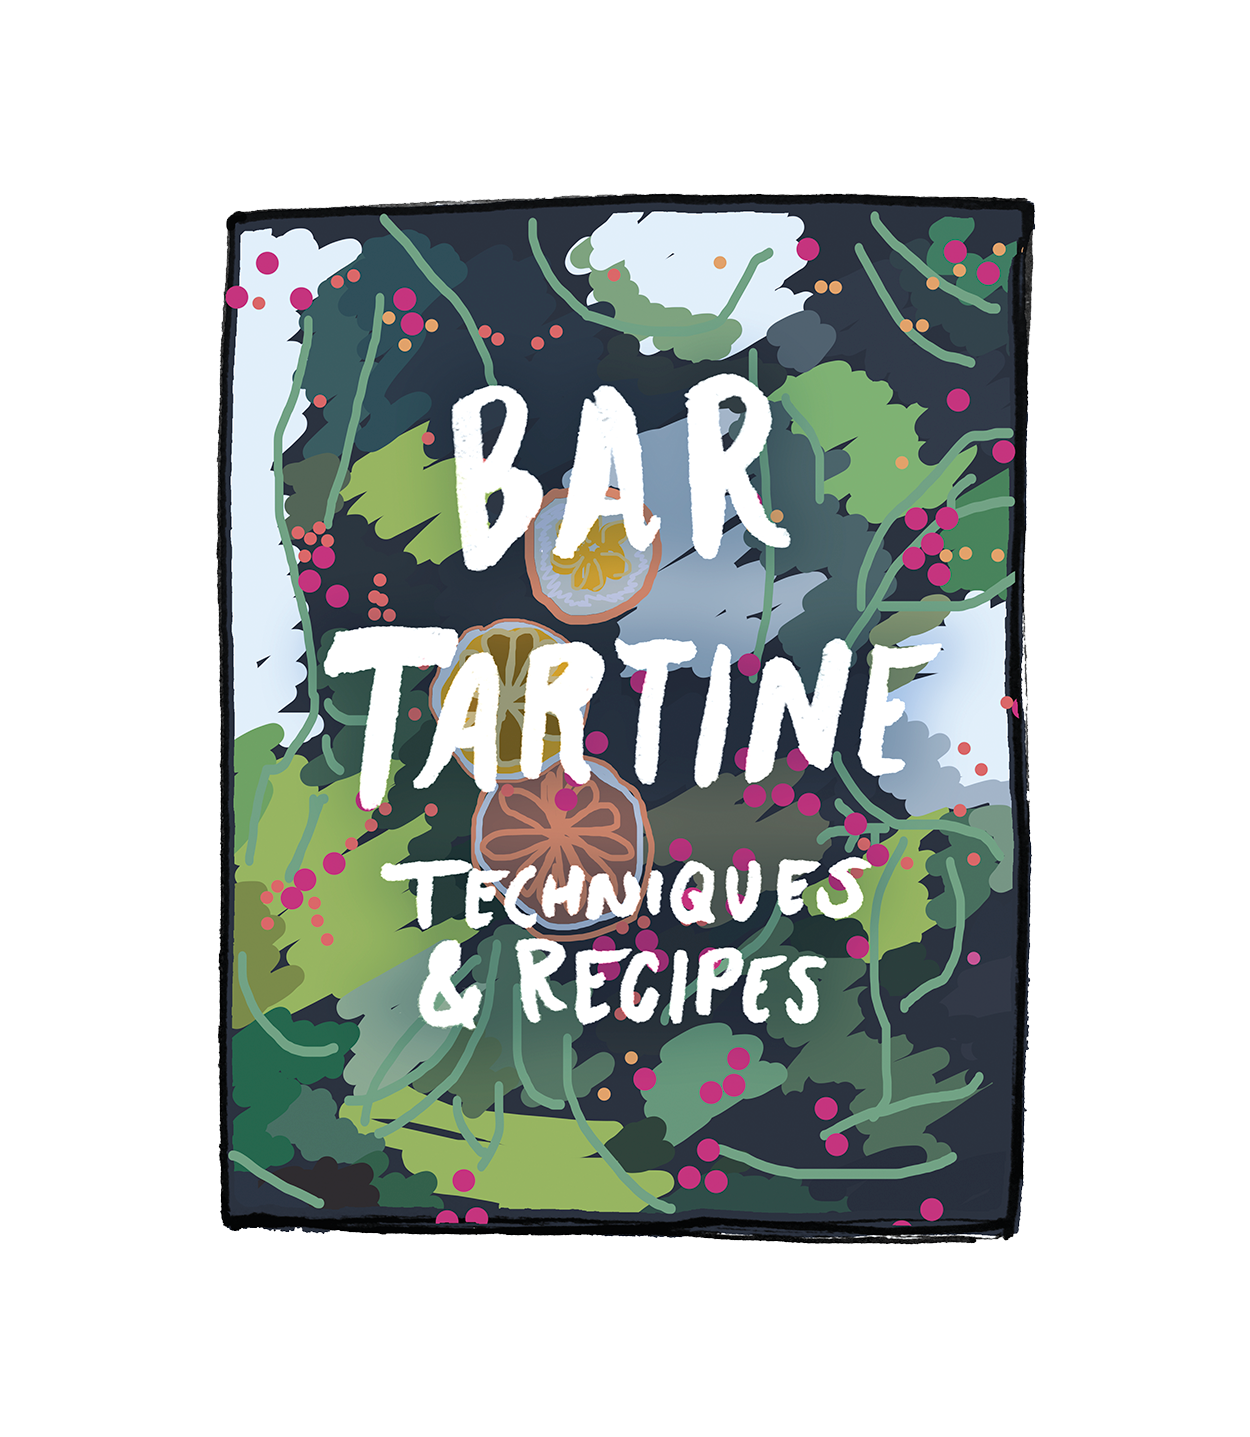 book-bar-tartine.png